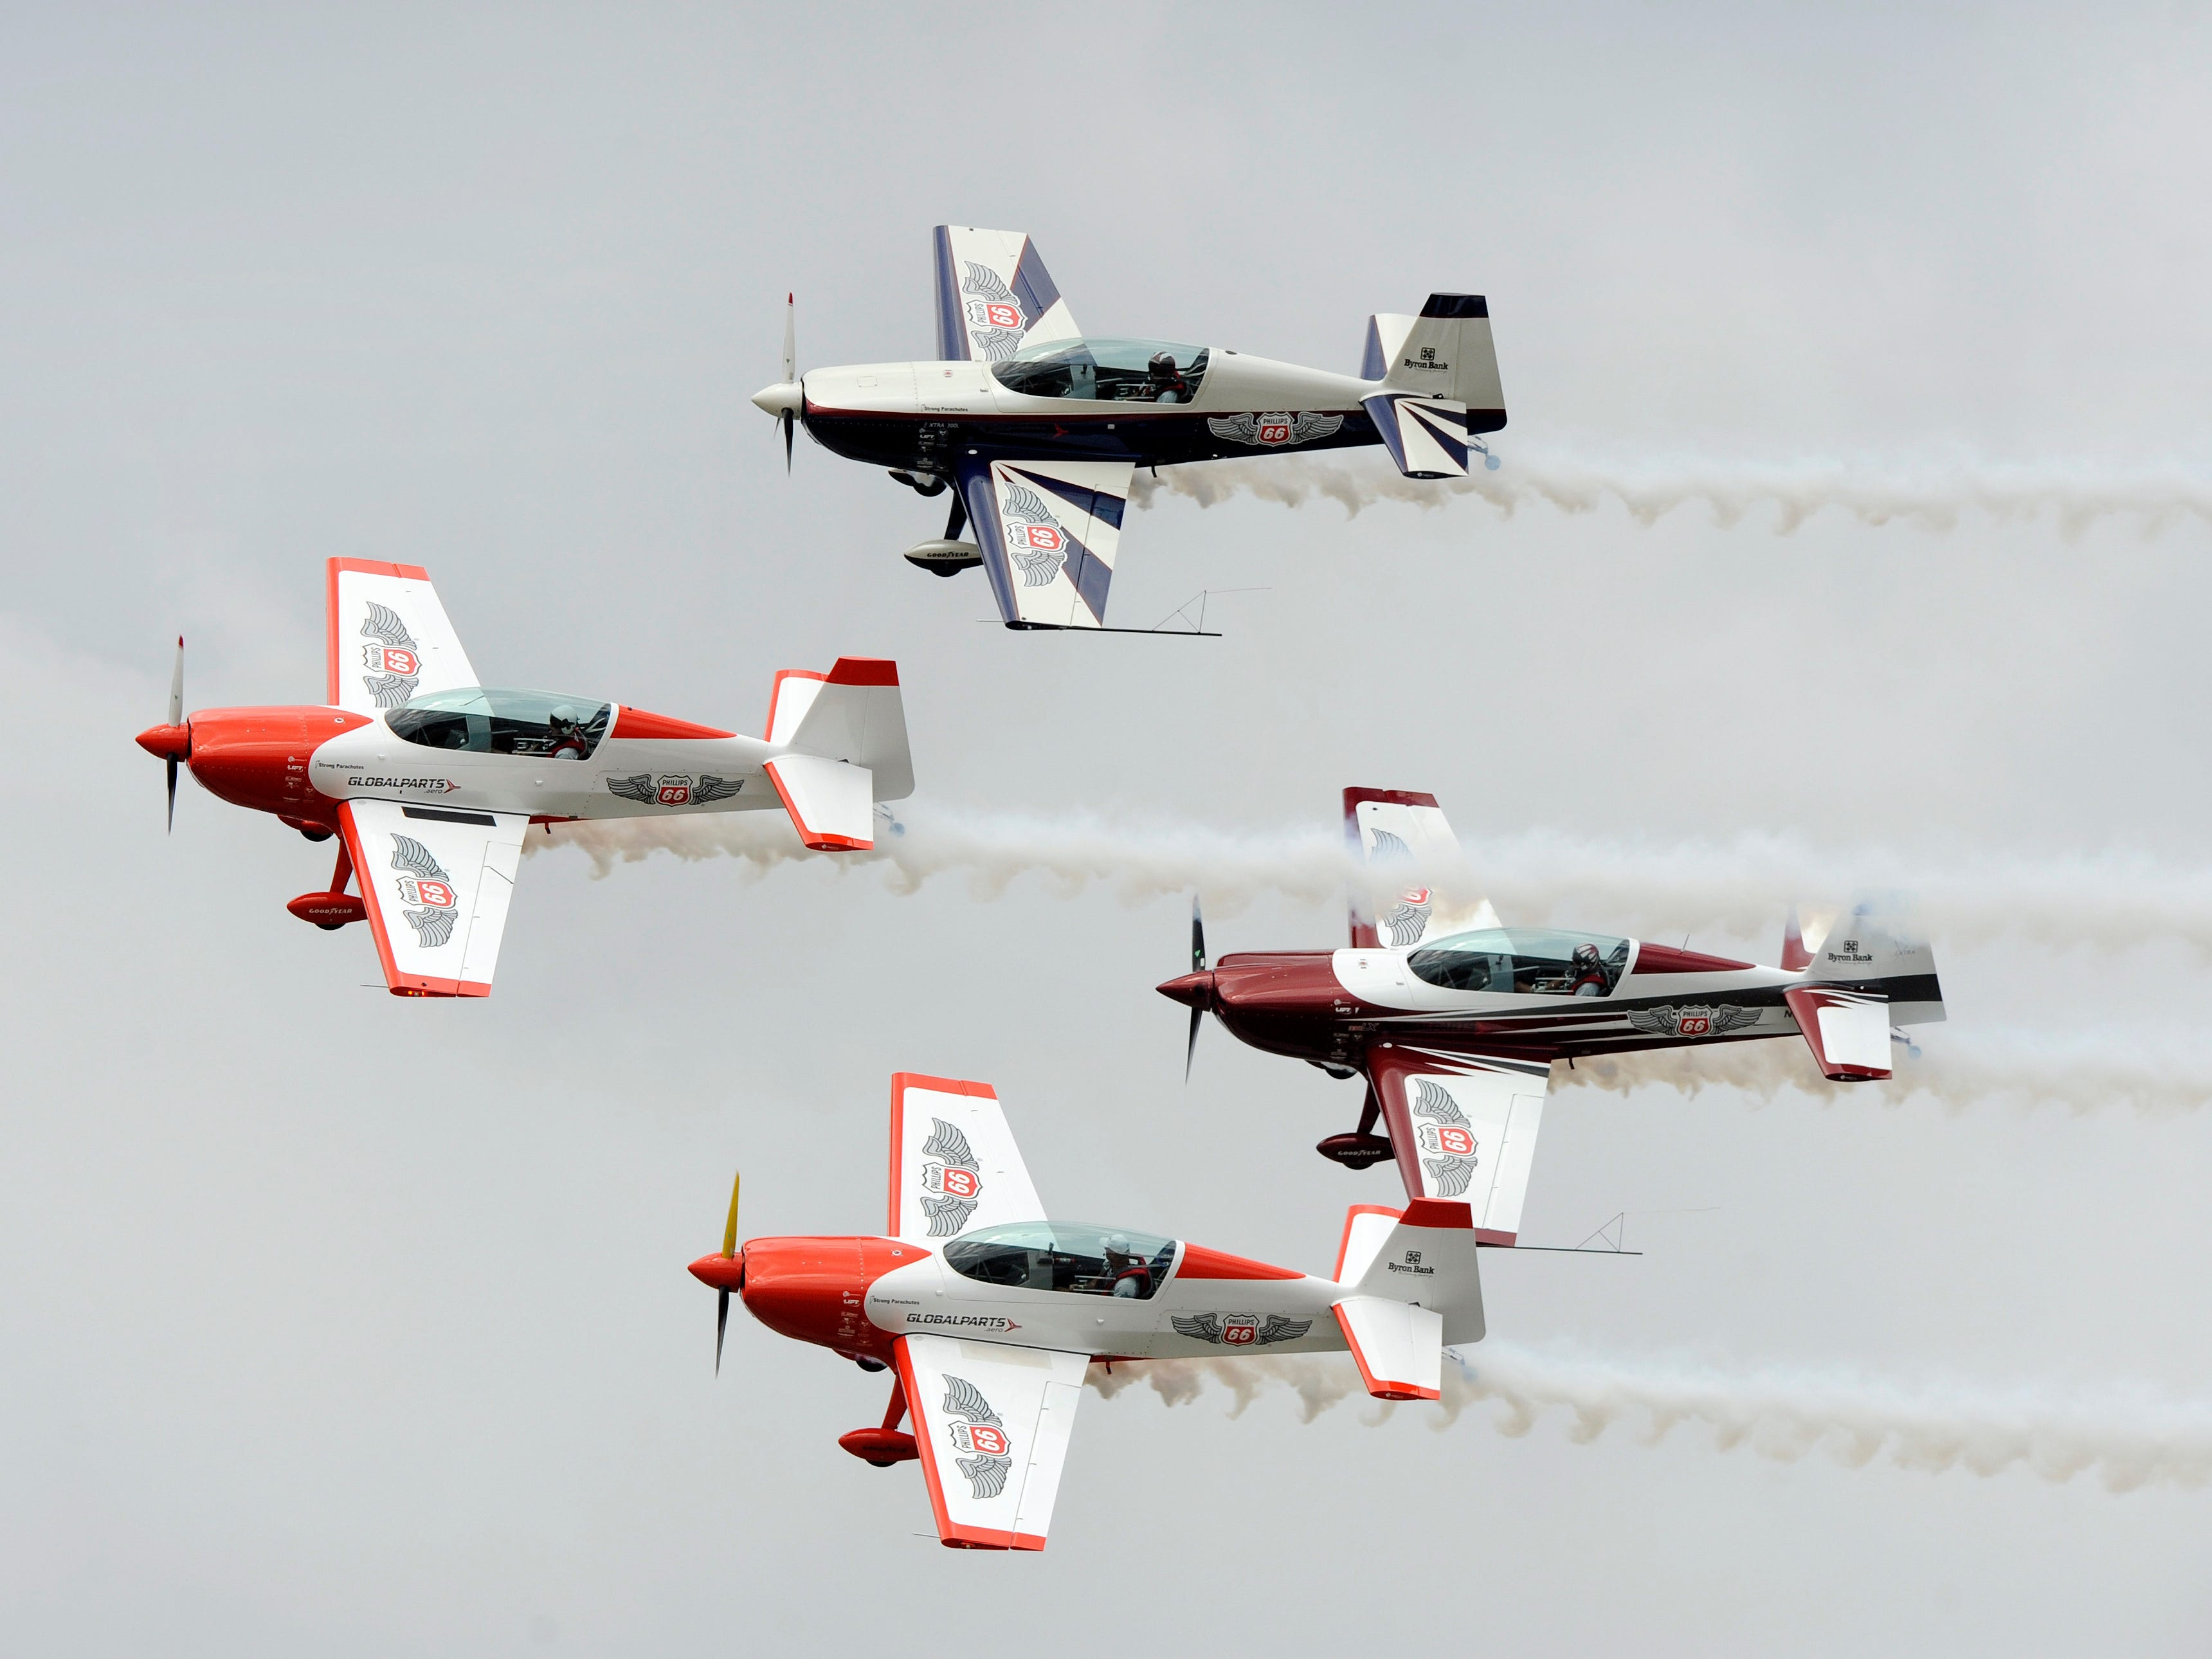 Aerobatic pilots thrill at Oakland County air show